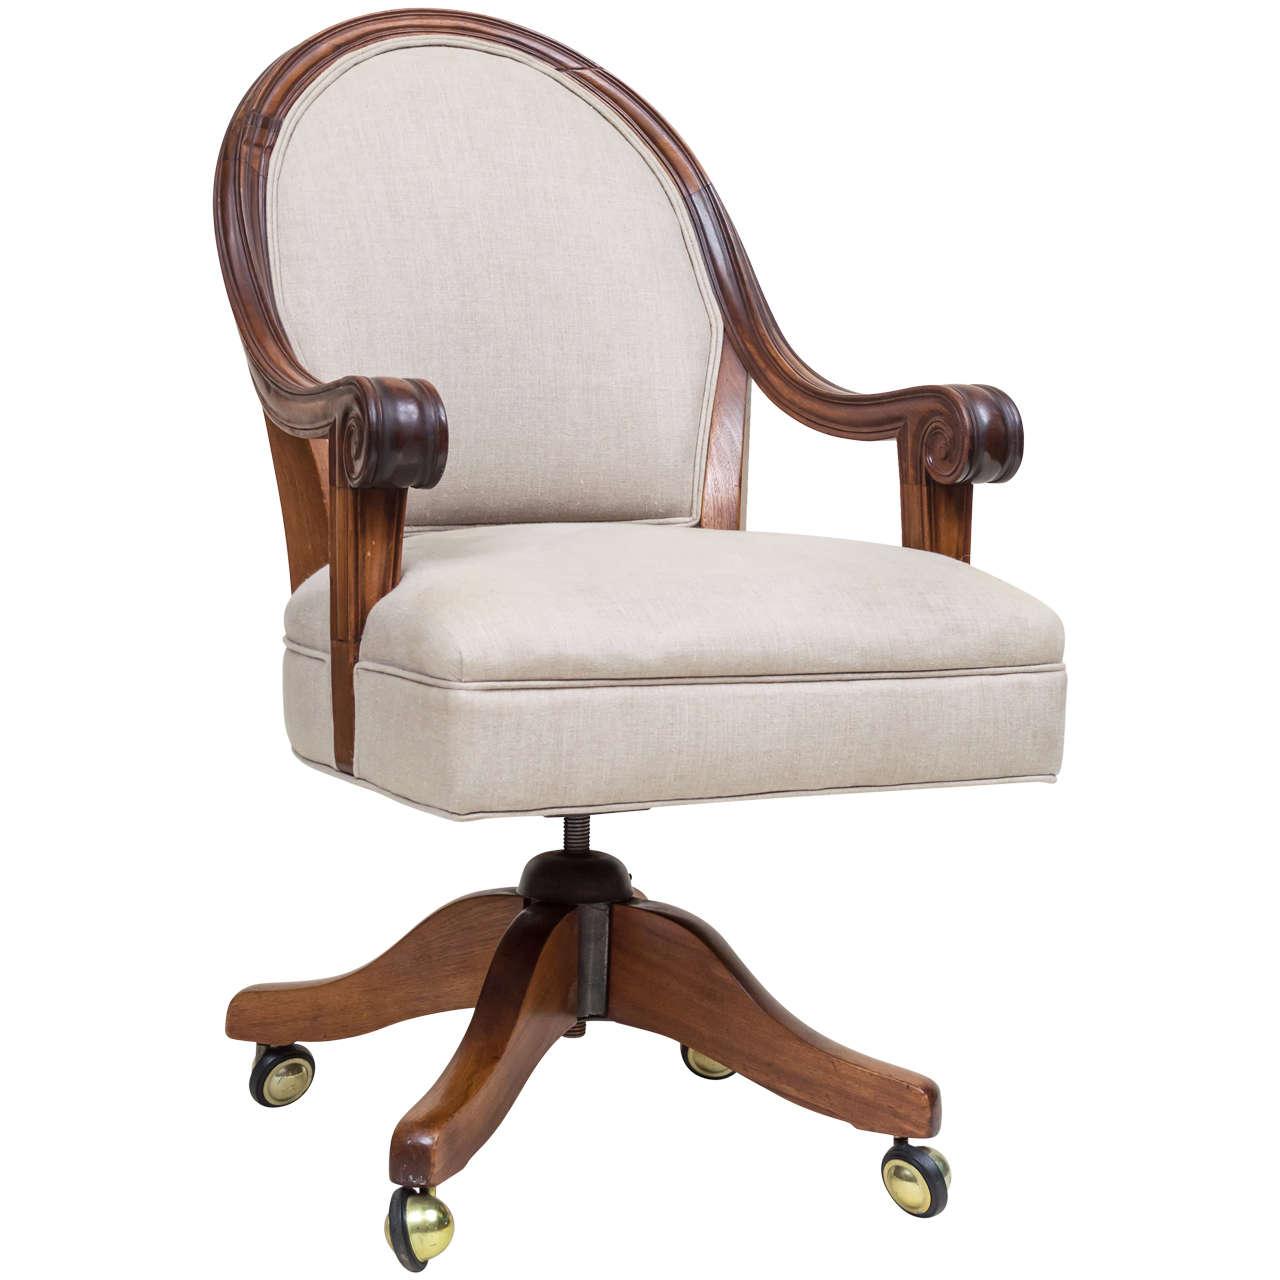 late victorian walnut desk chair for sale at 1stdibs. Black Bedroom Furniture Sets. Home Design Ideas